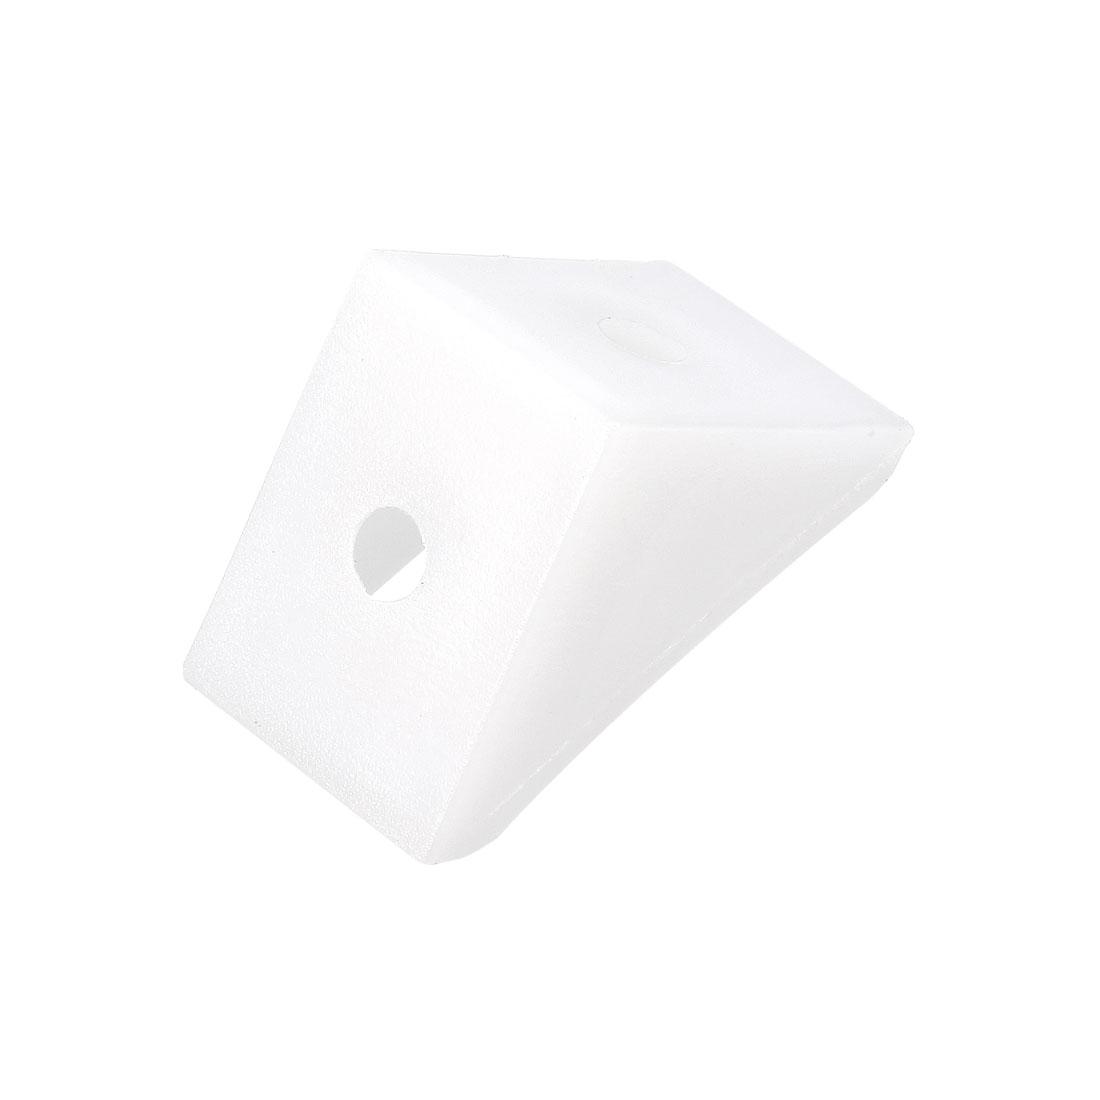 Shelf Cabinet Door 90 Degree Plastic Corner Braces 2 Holes Angle Bracket 100 Pcs